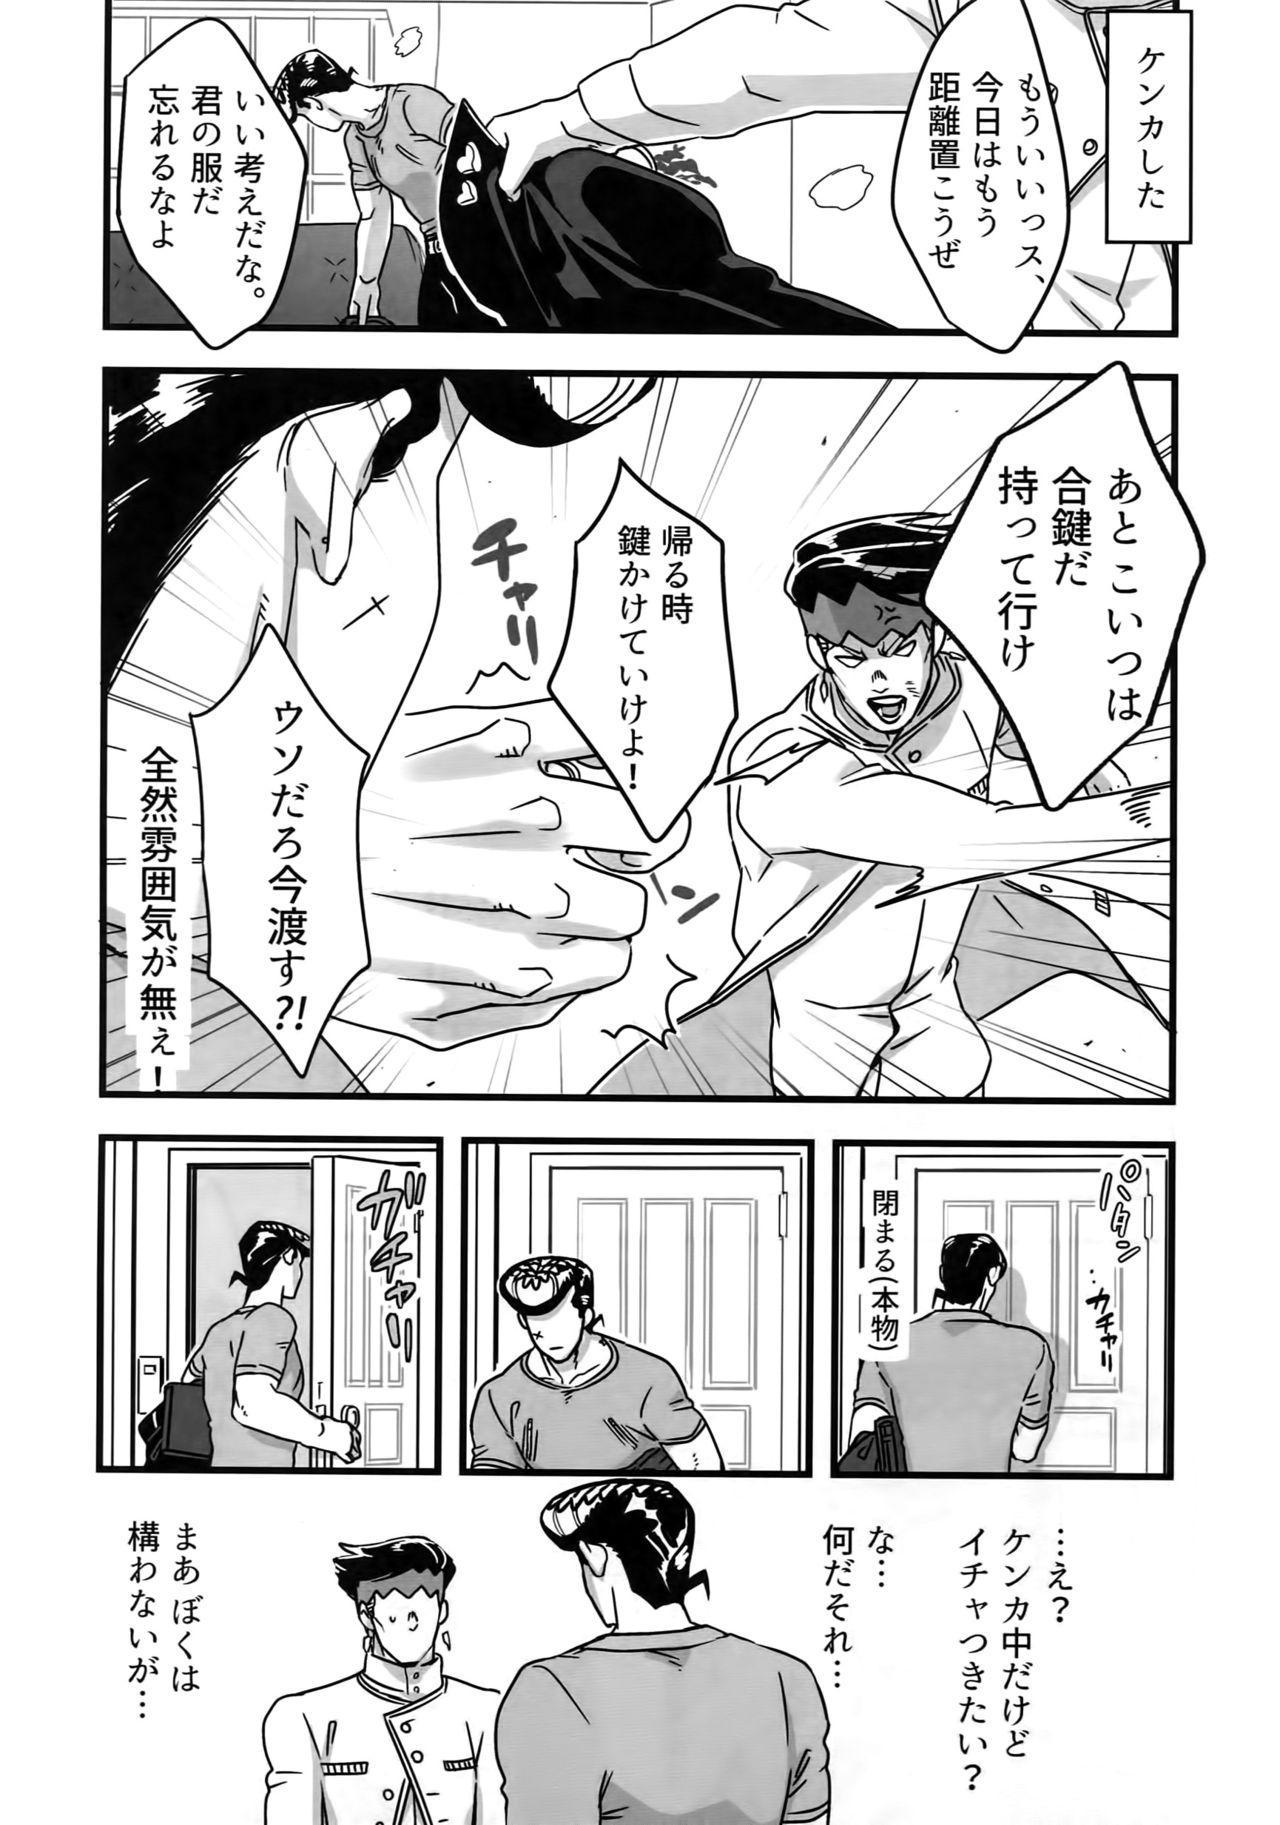 NuruNuru JoRo Sairokubon 118